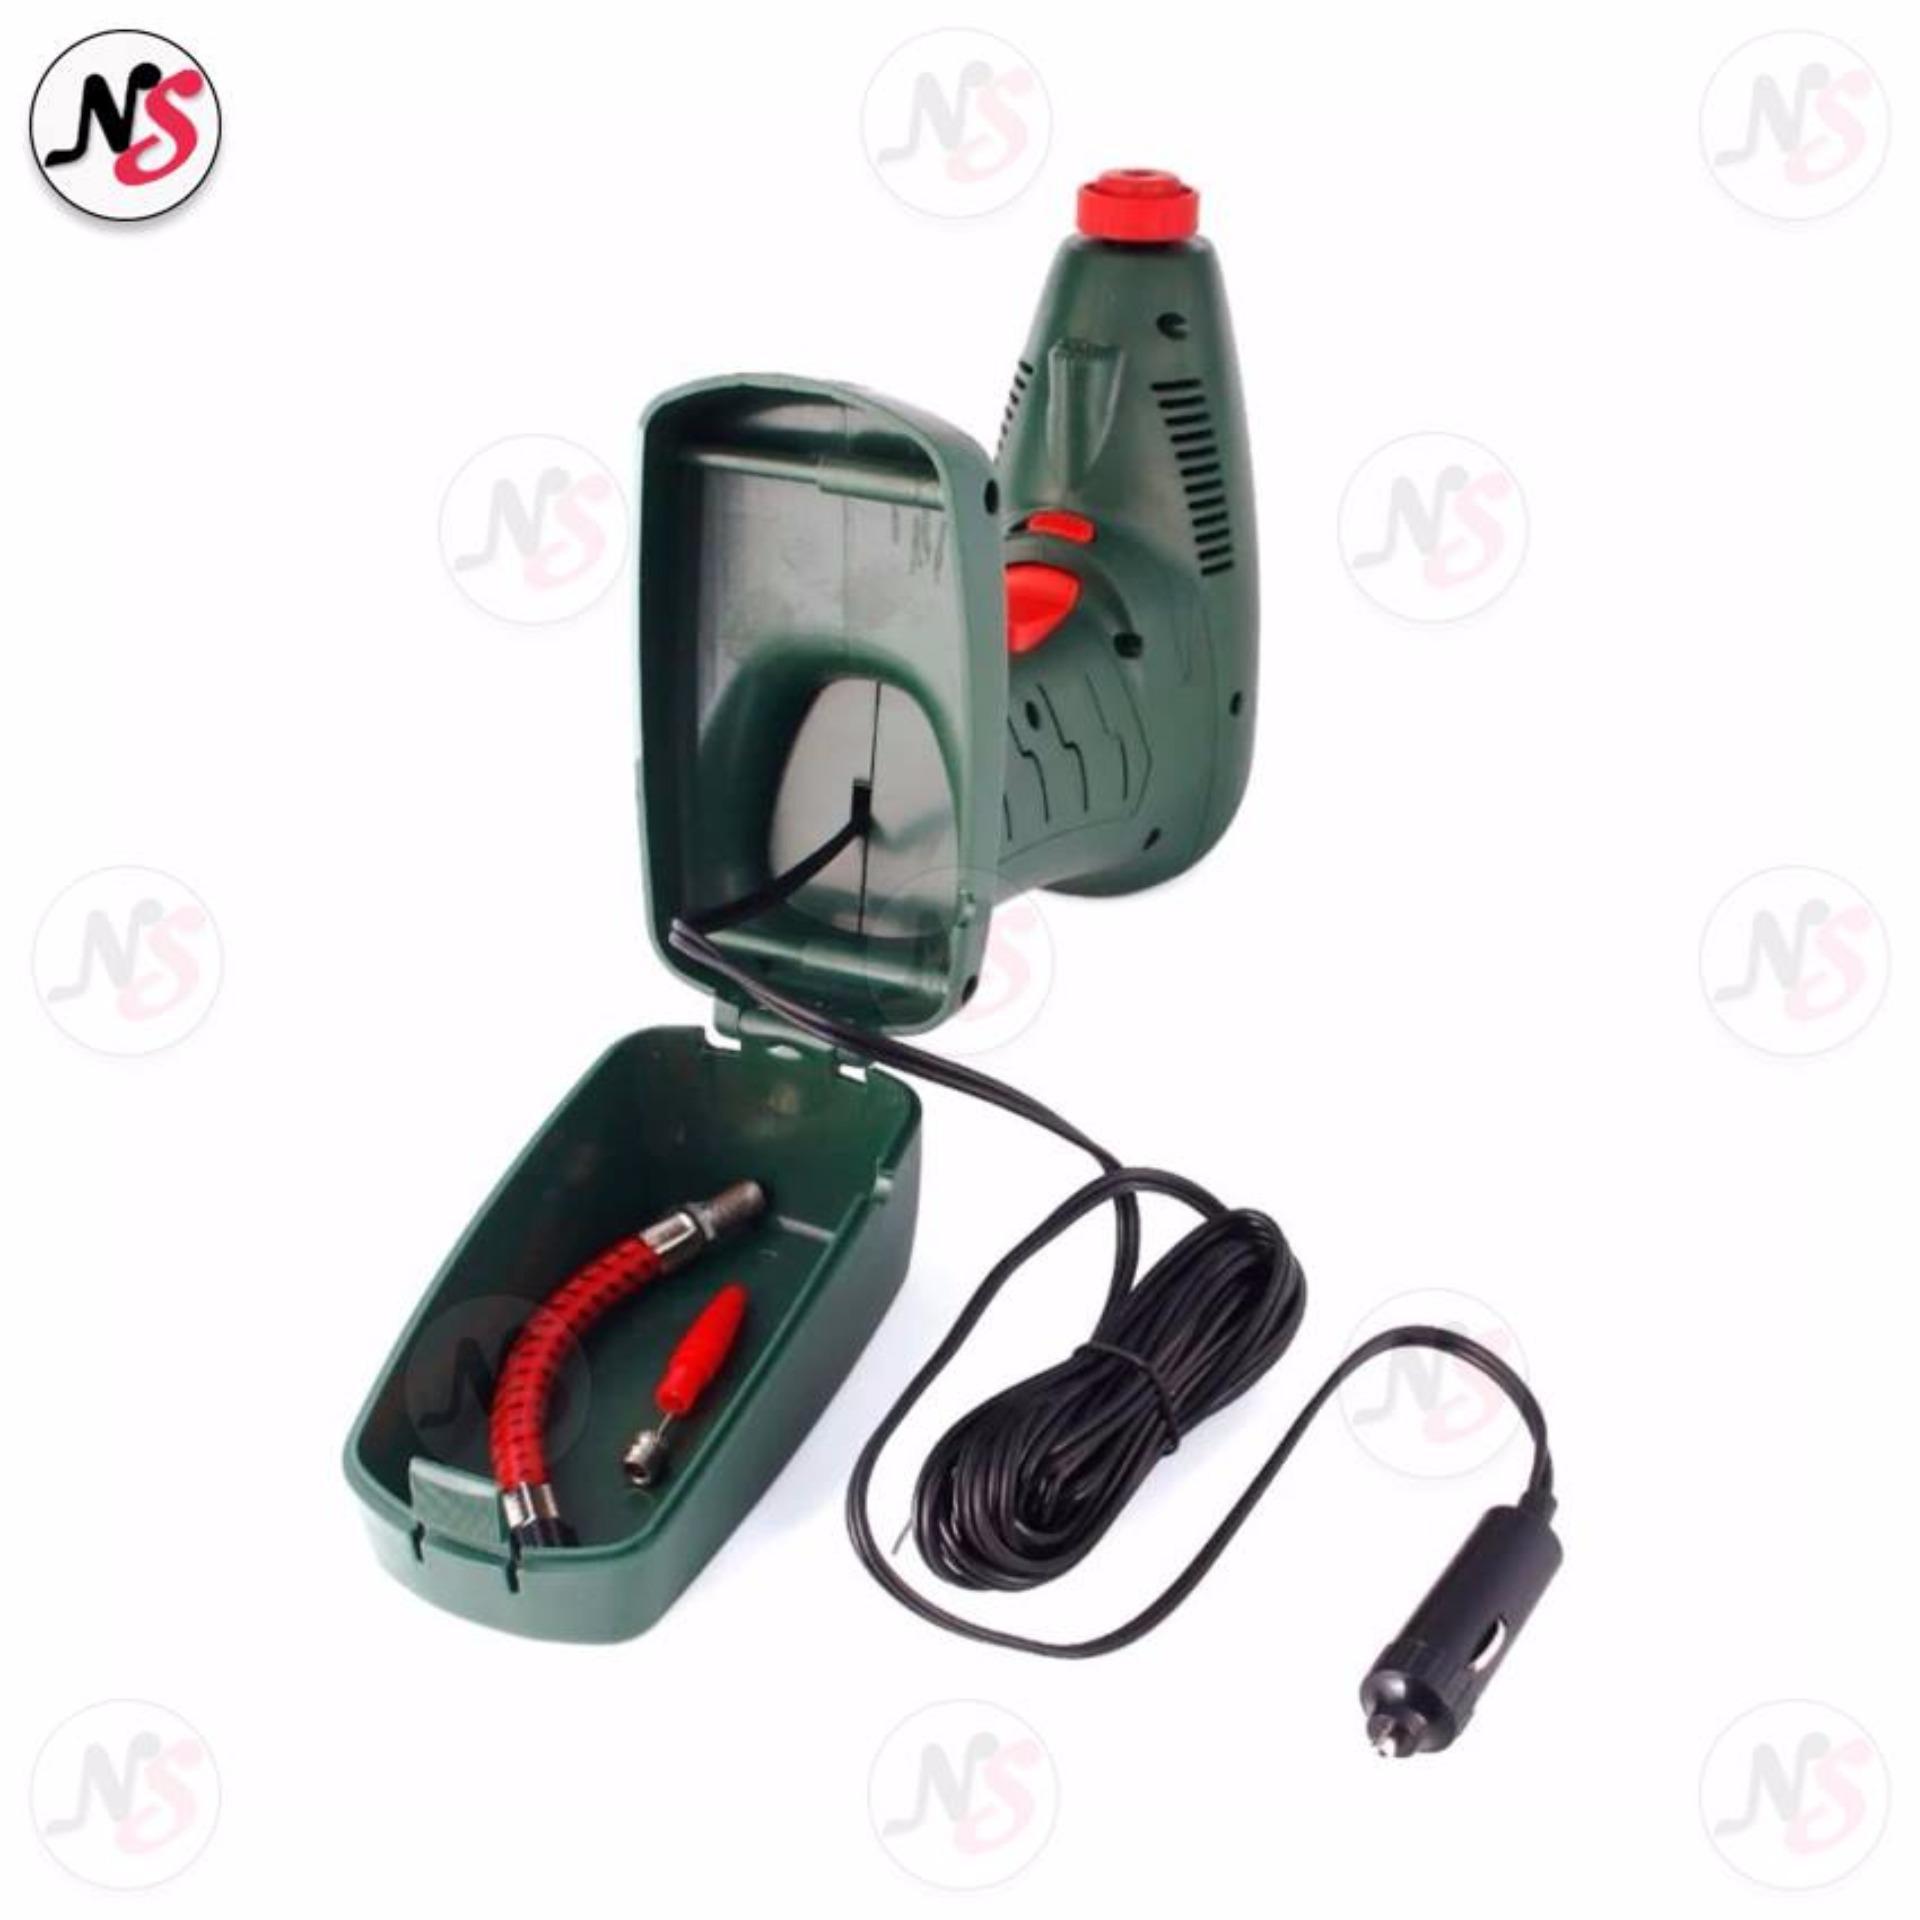 Air Dragon Handheld Portable Air Compressor Auto Tire Inflator Balls Mattress Toys Pump Emergency Tool ...